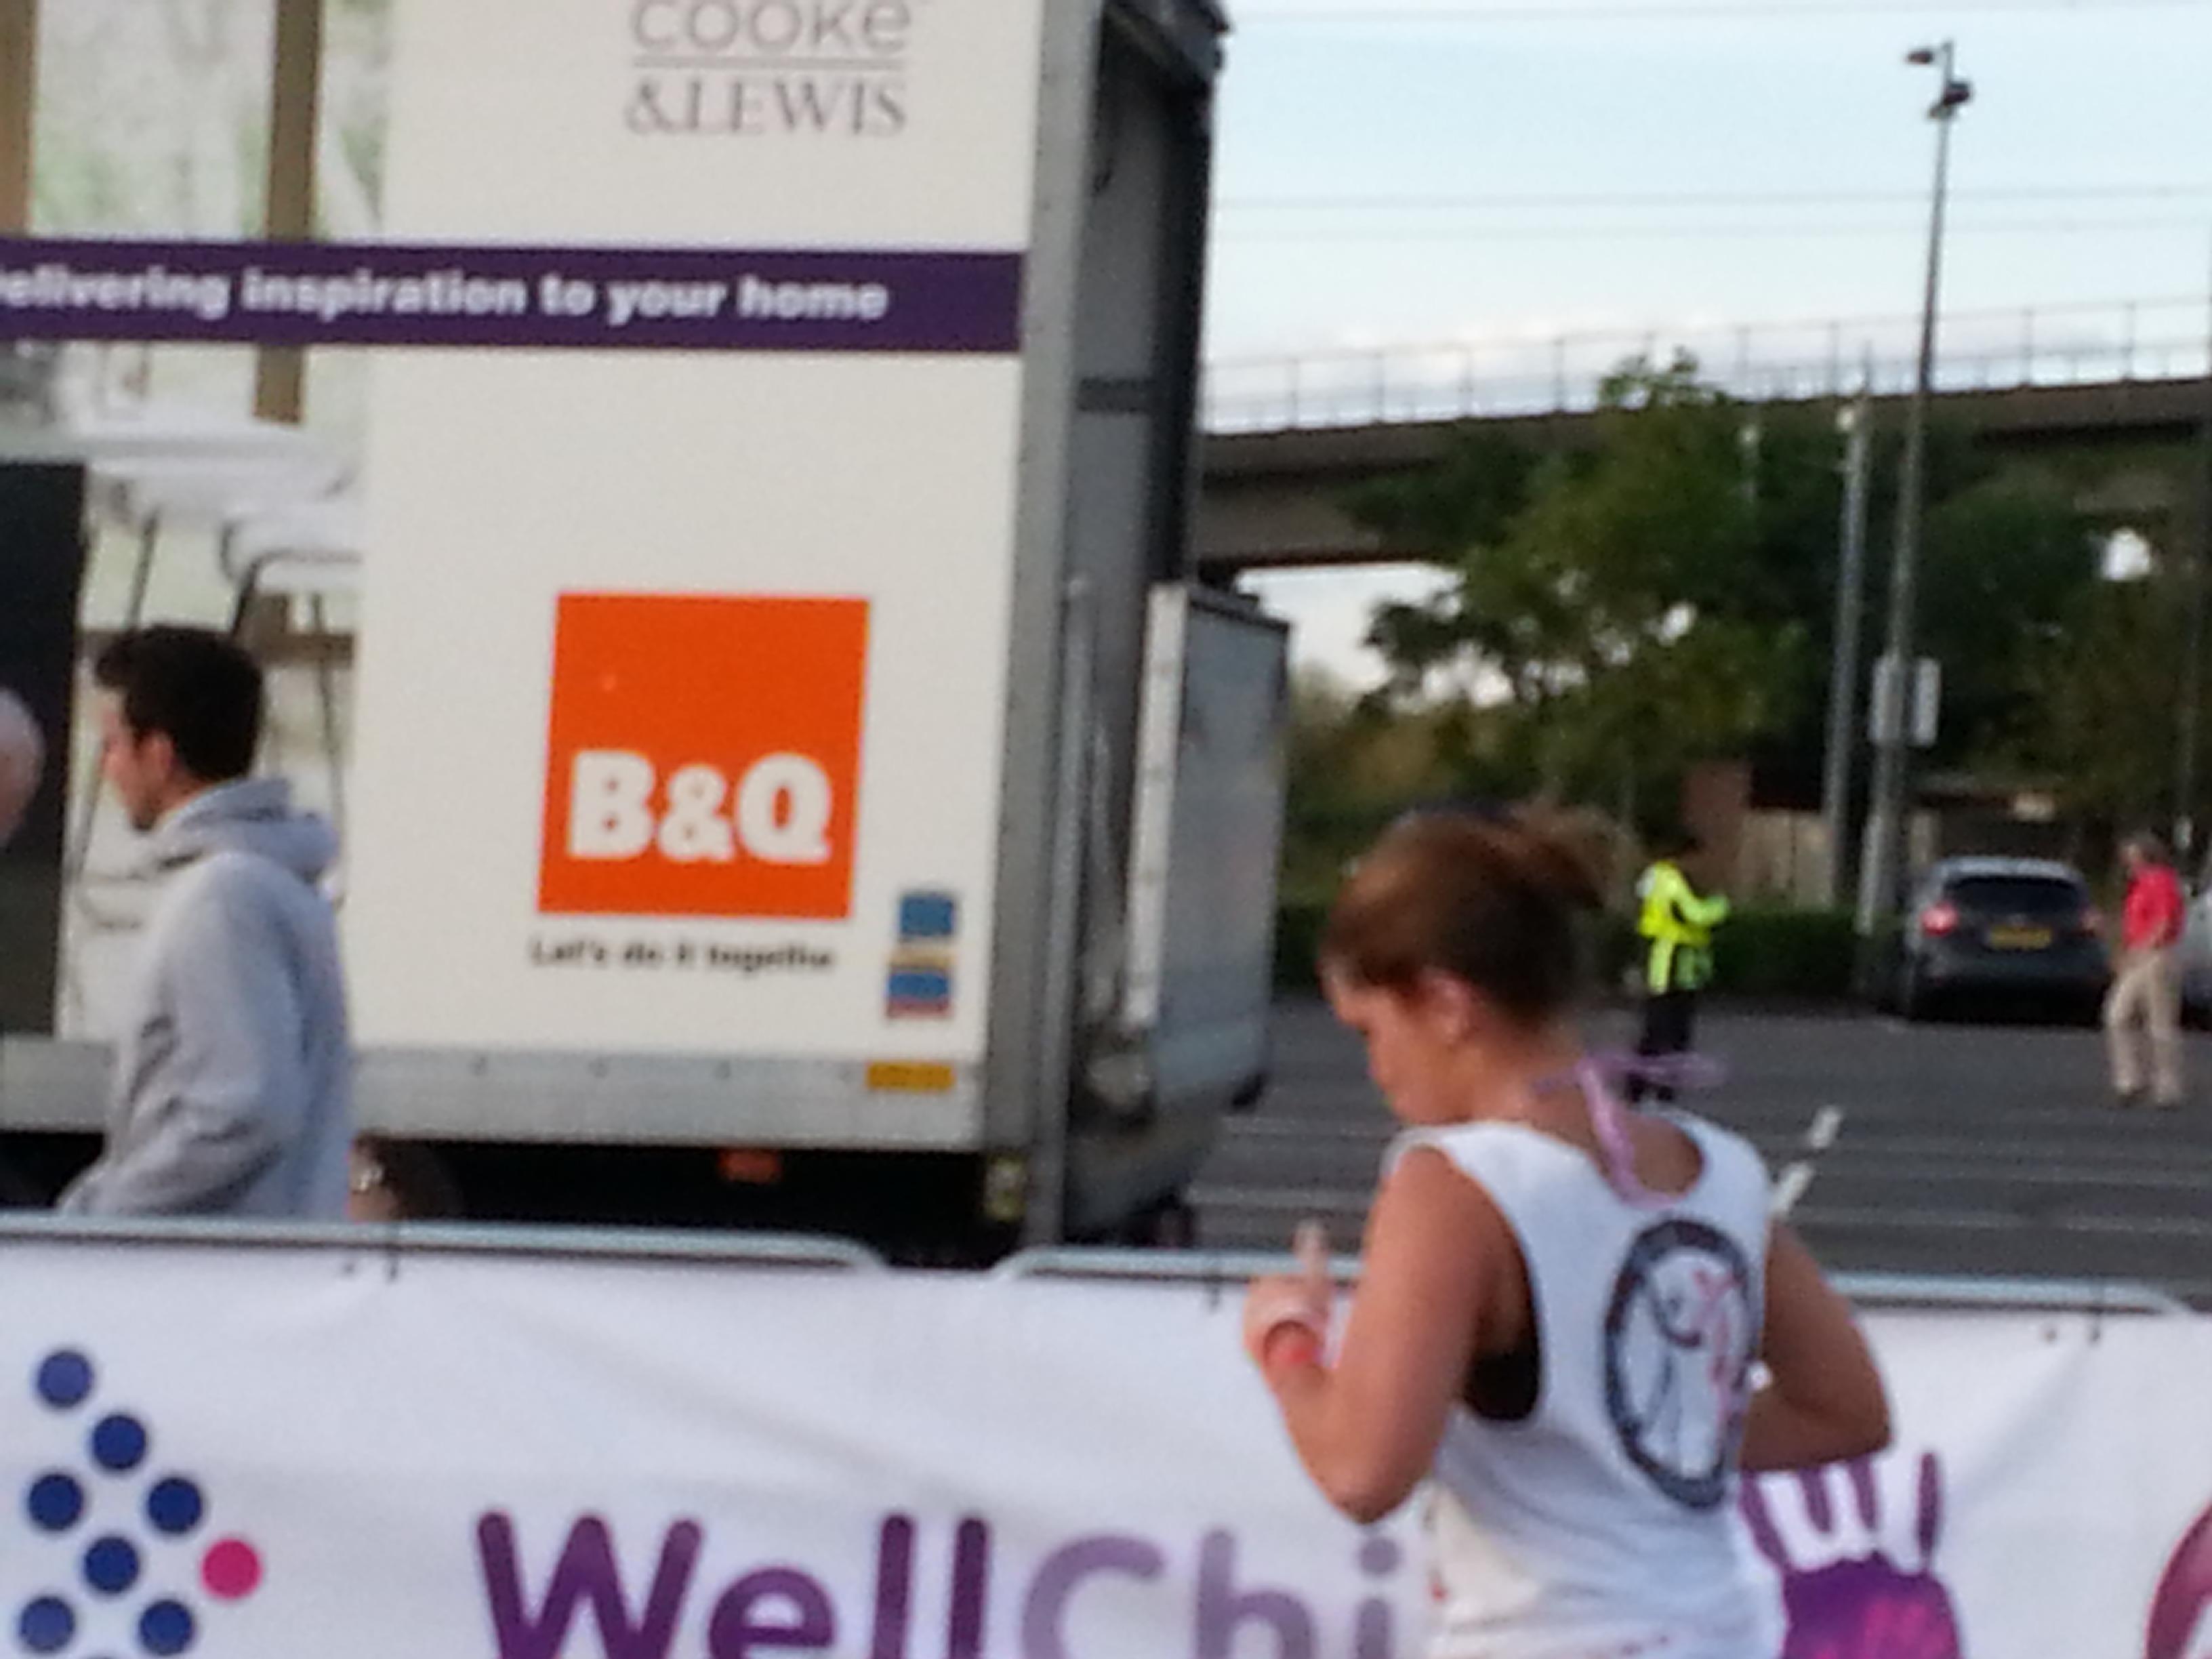 Running for danceaid at the London Triathlon 2012